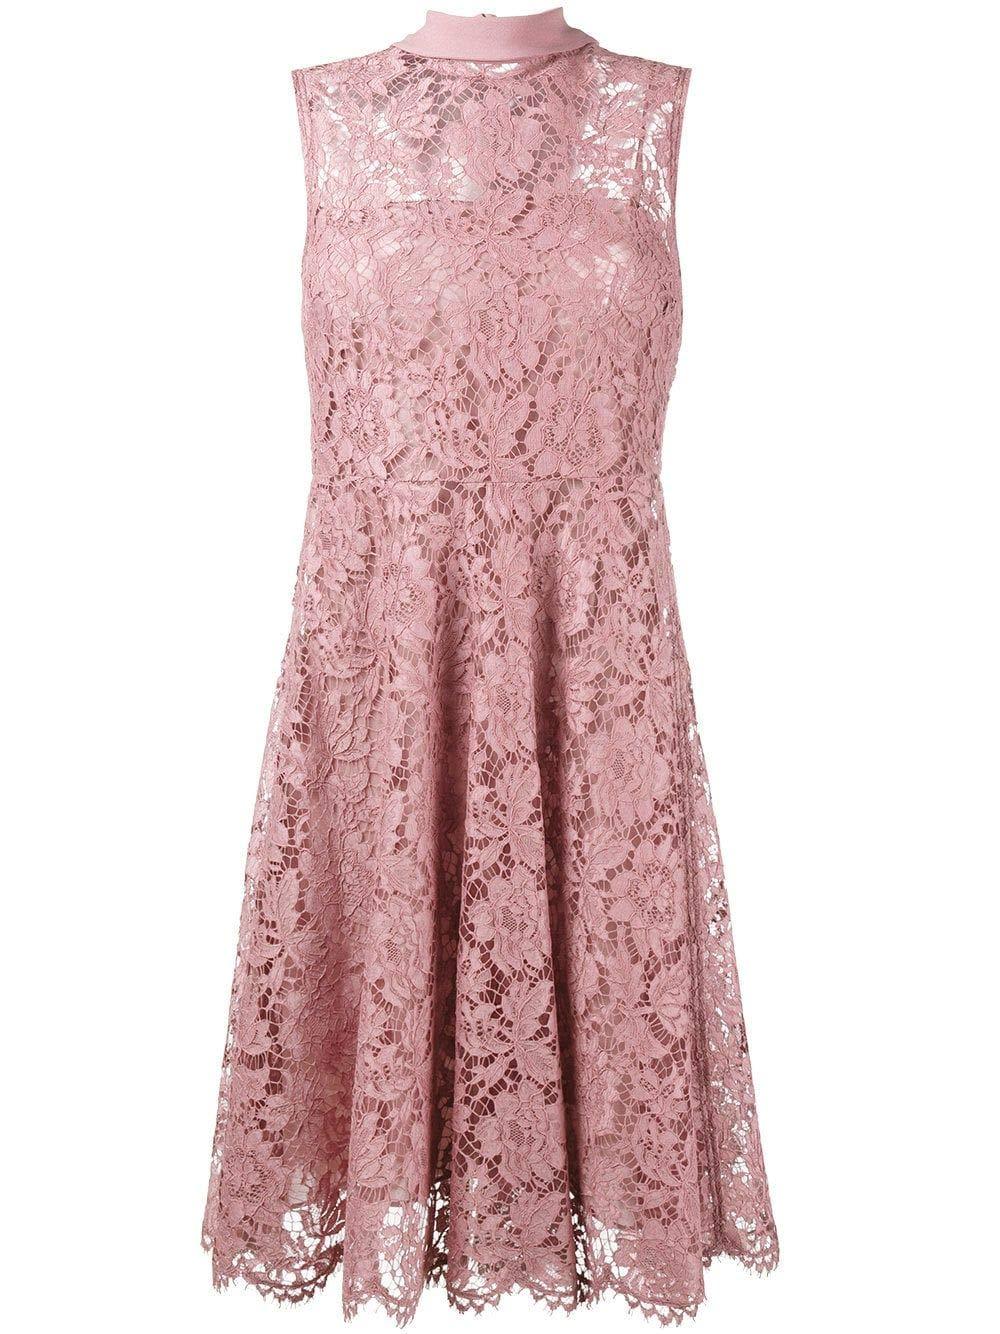 Valentino Women's NB3VAEC01EC34C Pink Silk Dress